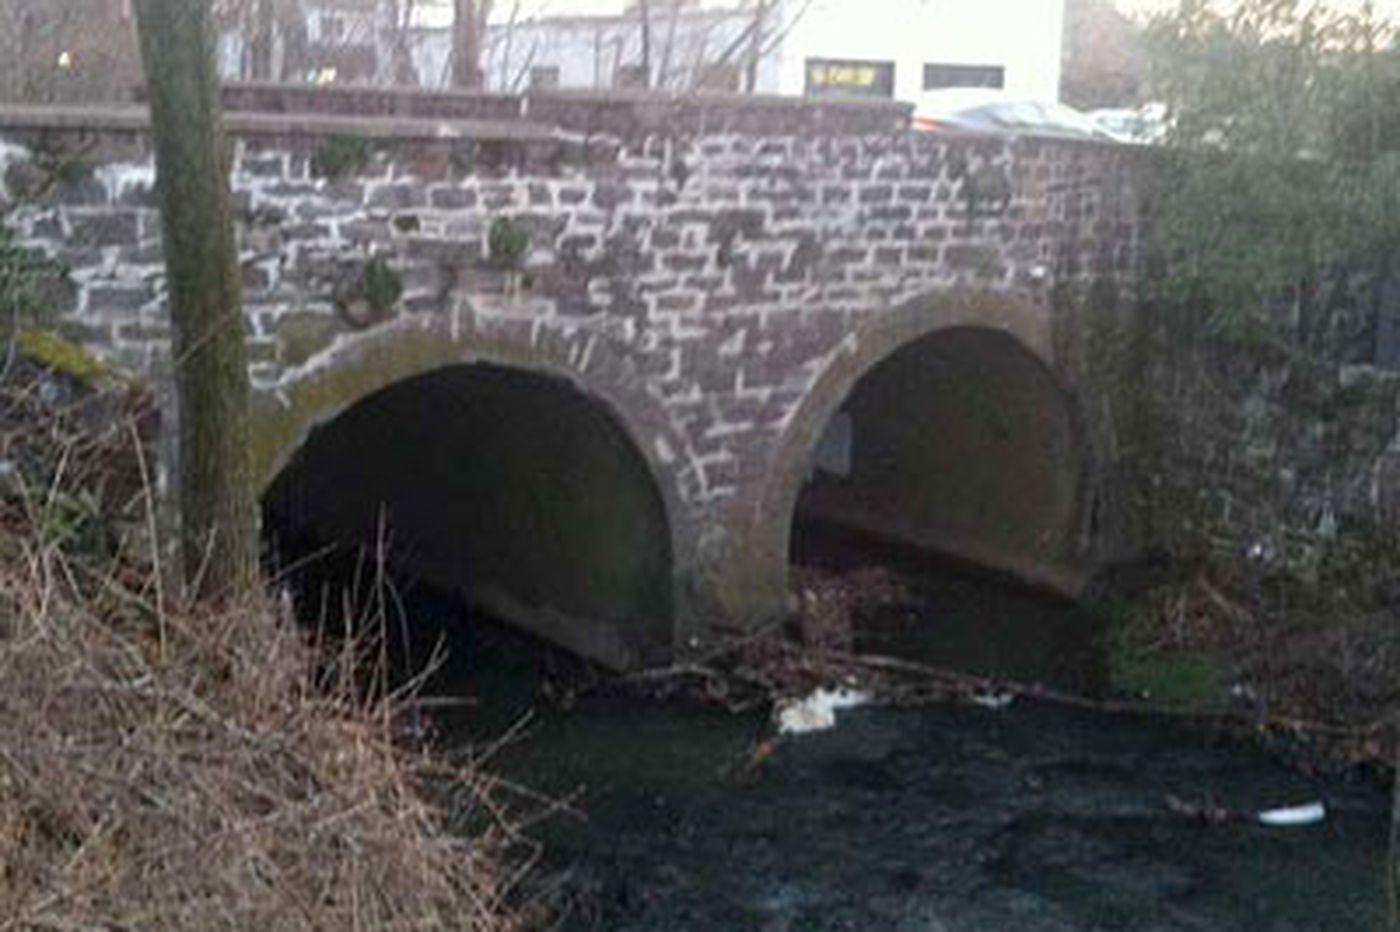 Plan to rebuild Bucks' oldest bridge meets resistance